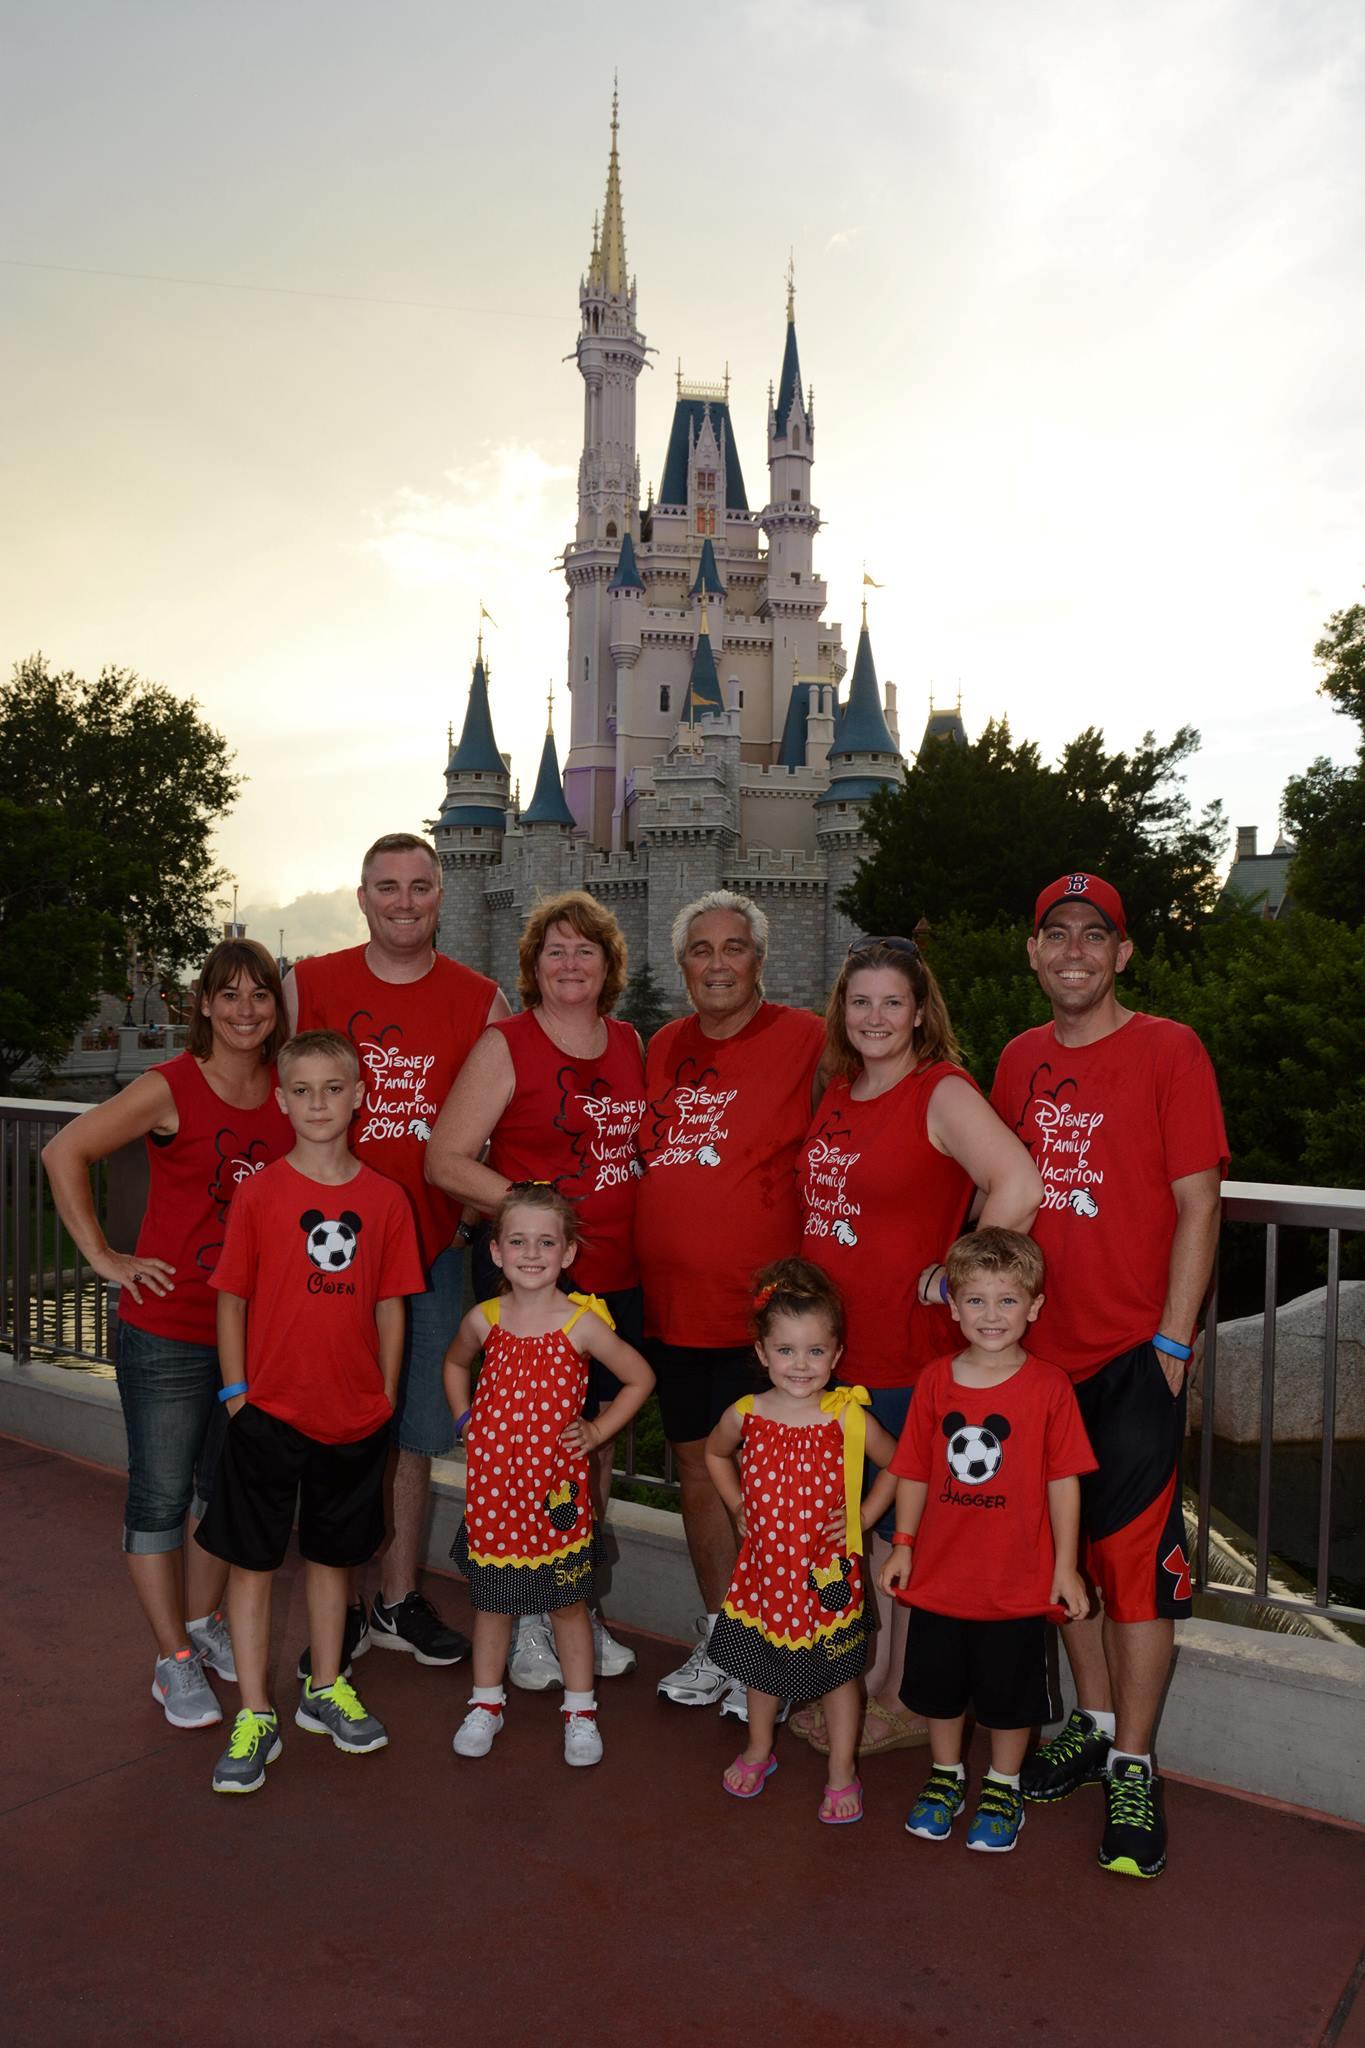 Disney Magic Kingdom Family Photo